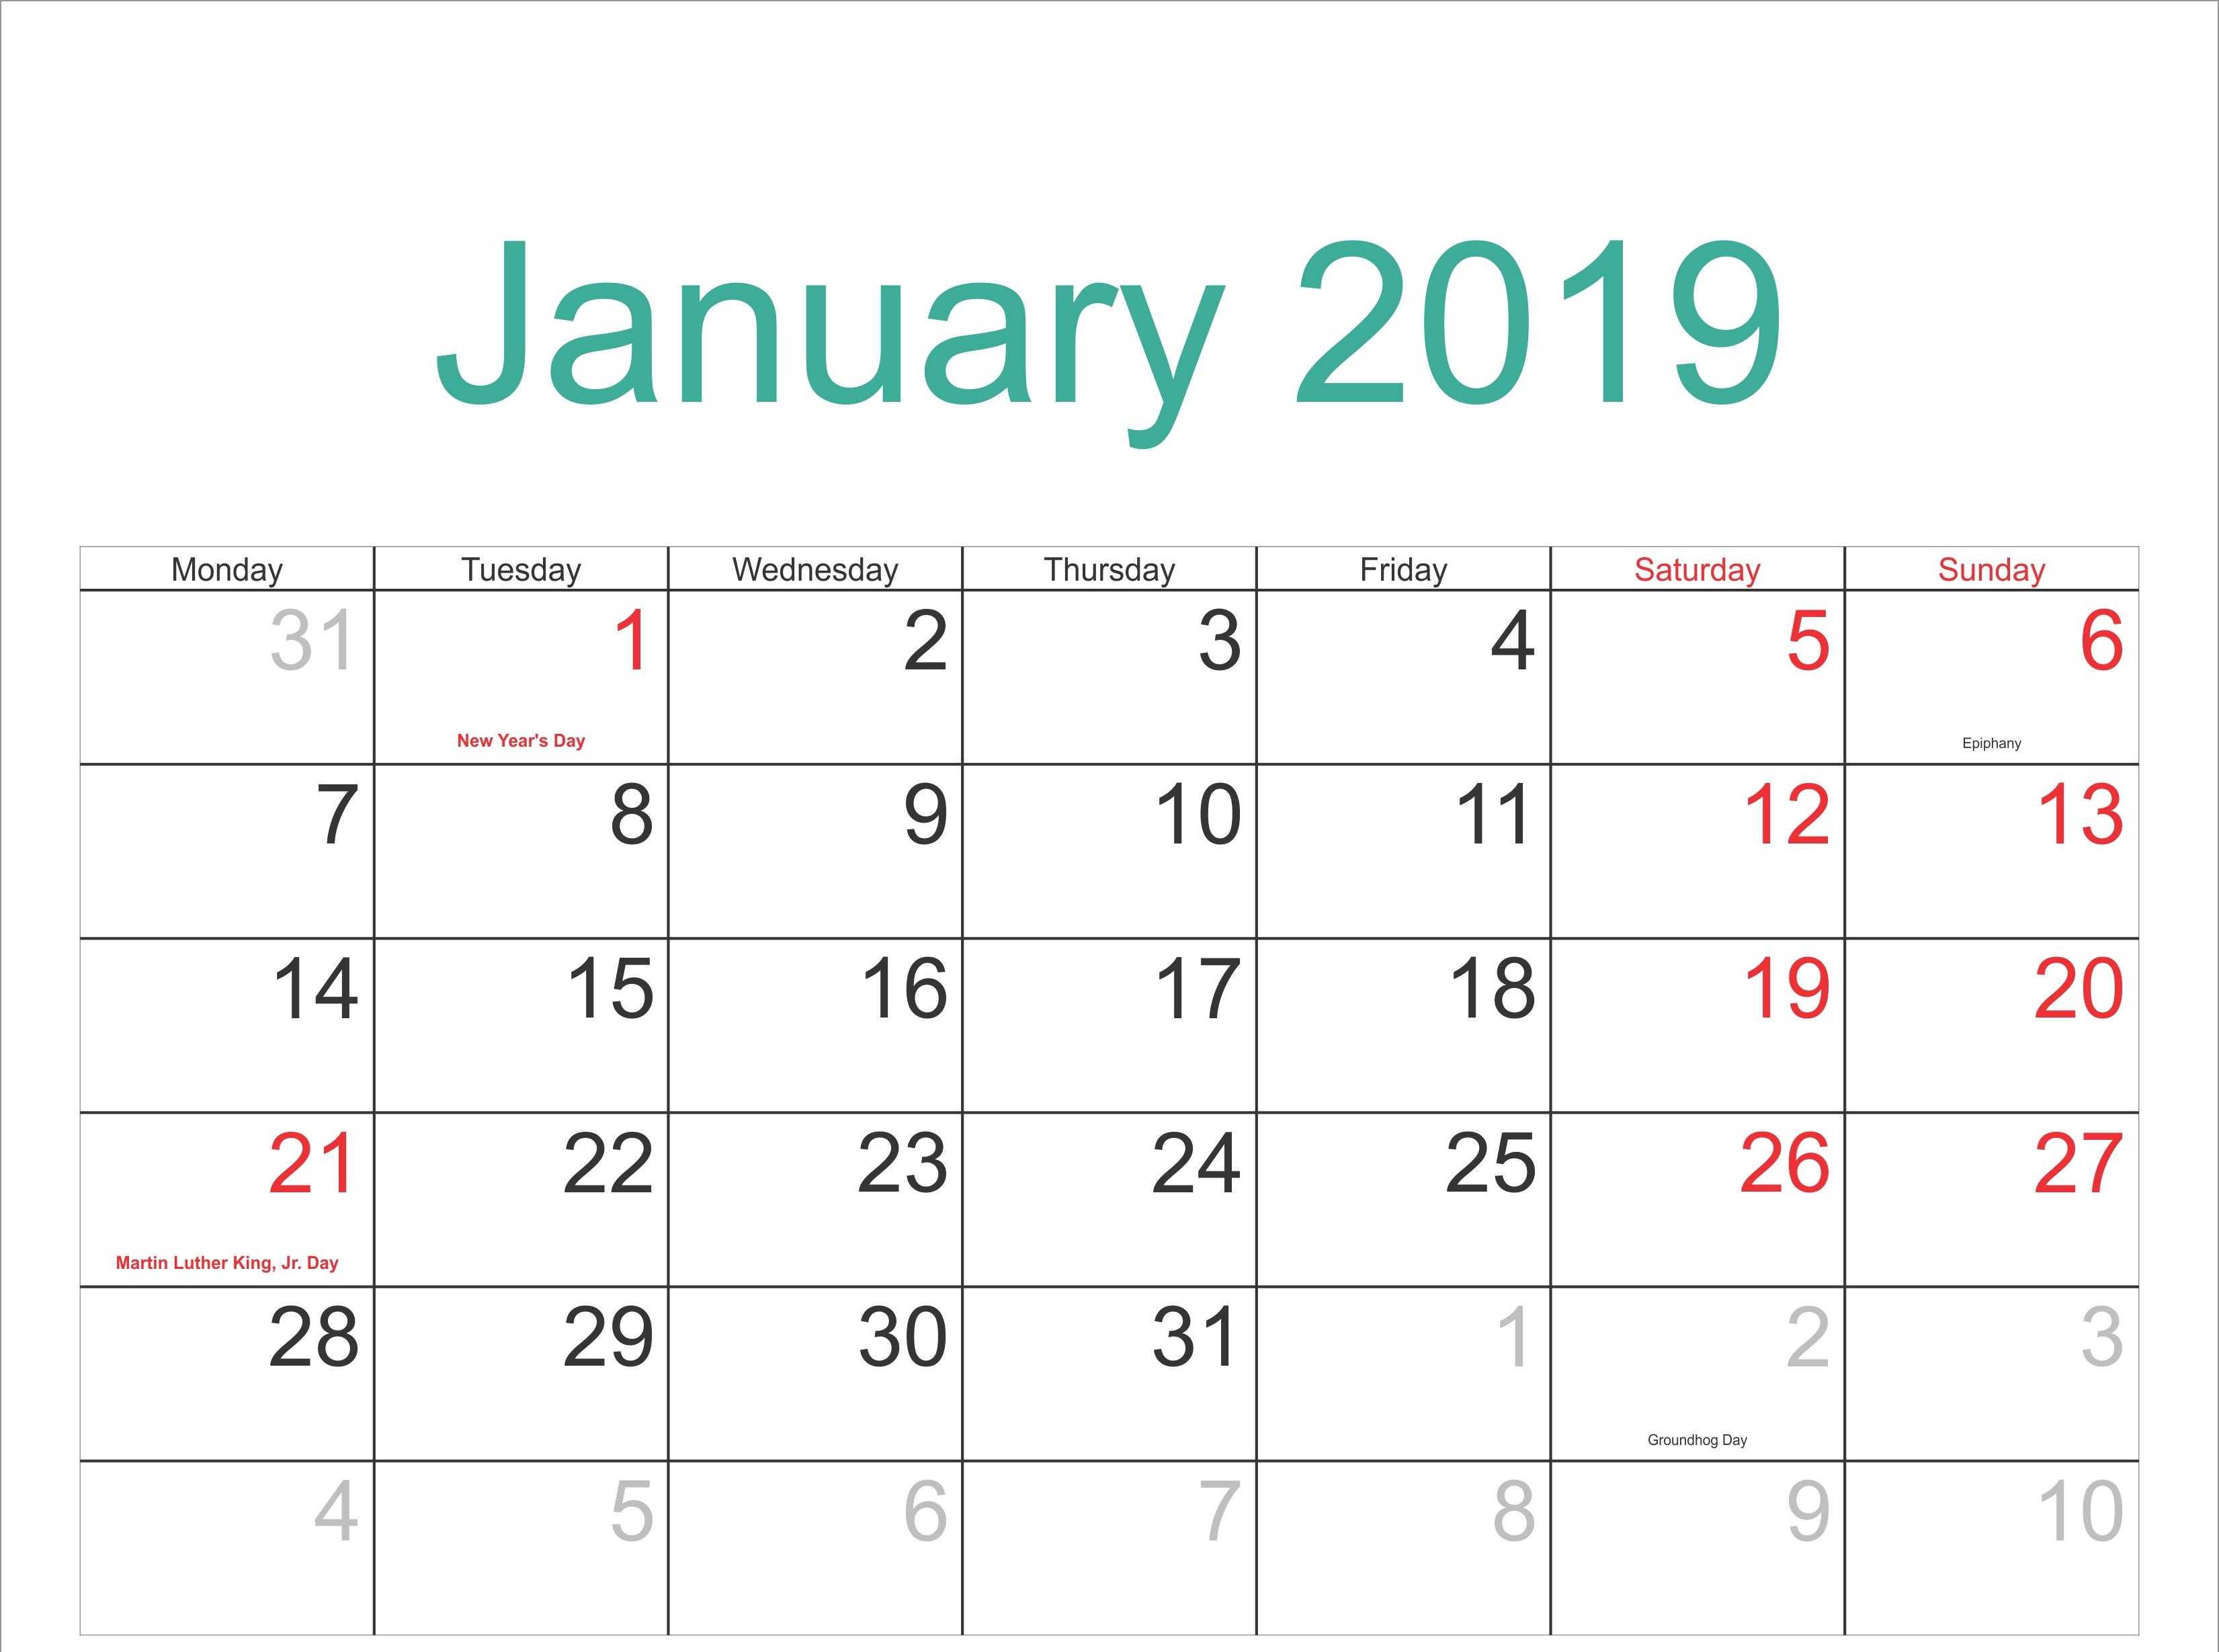 January 2019 Calendar Festivals Pdf – Free January 2019 Calendar Calendar Of 2019 With Festivals